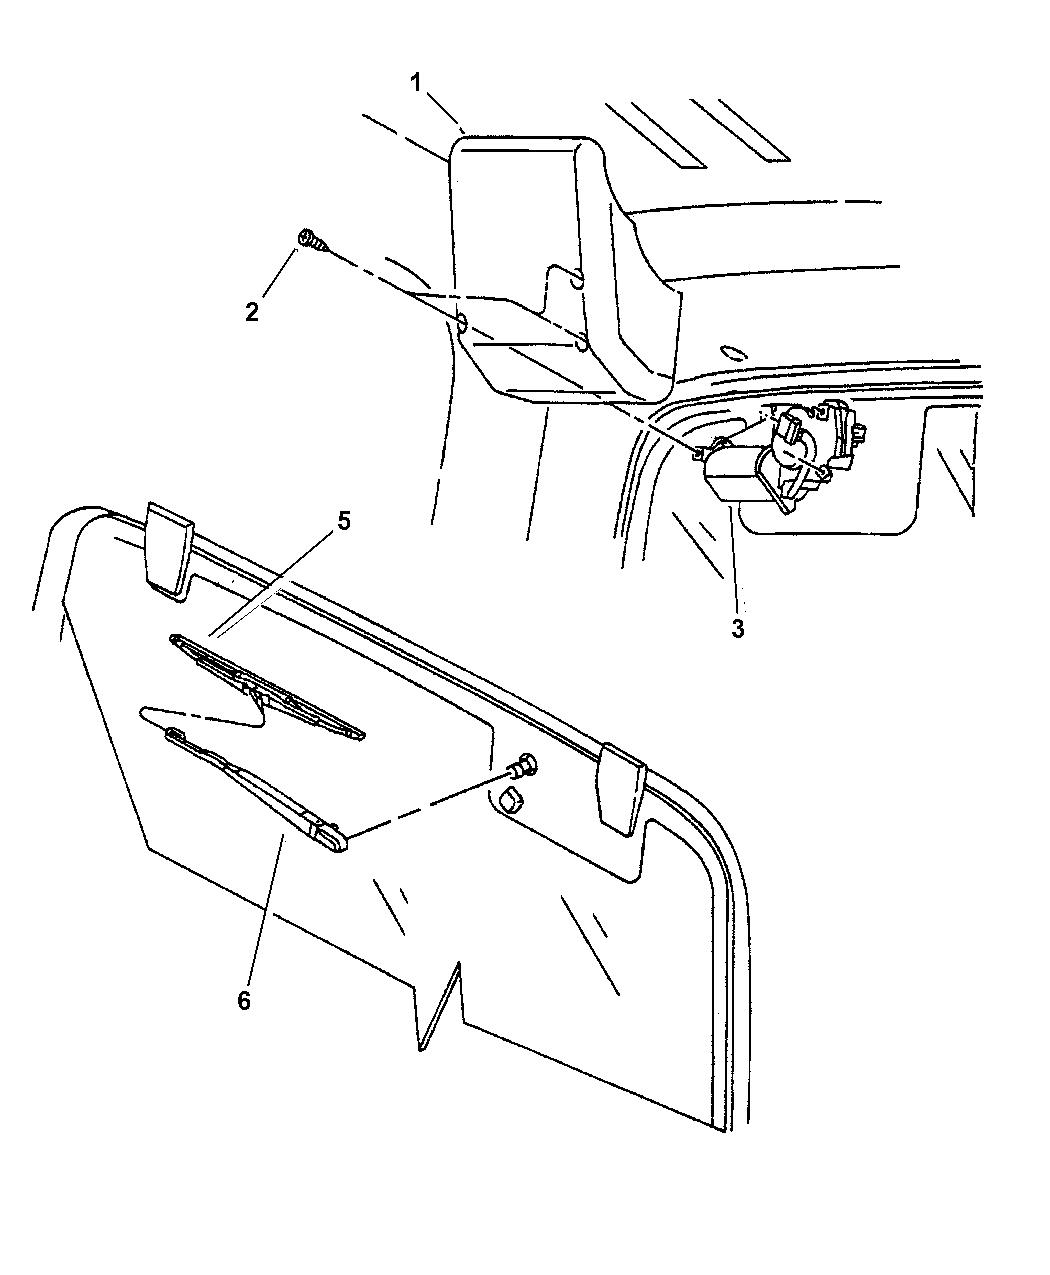 2002 Jeep Wrangler Rear Wiper System